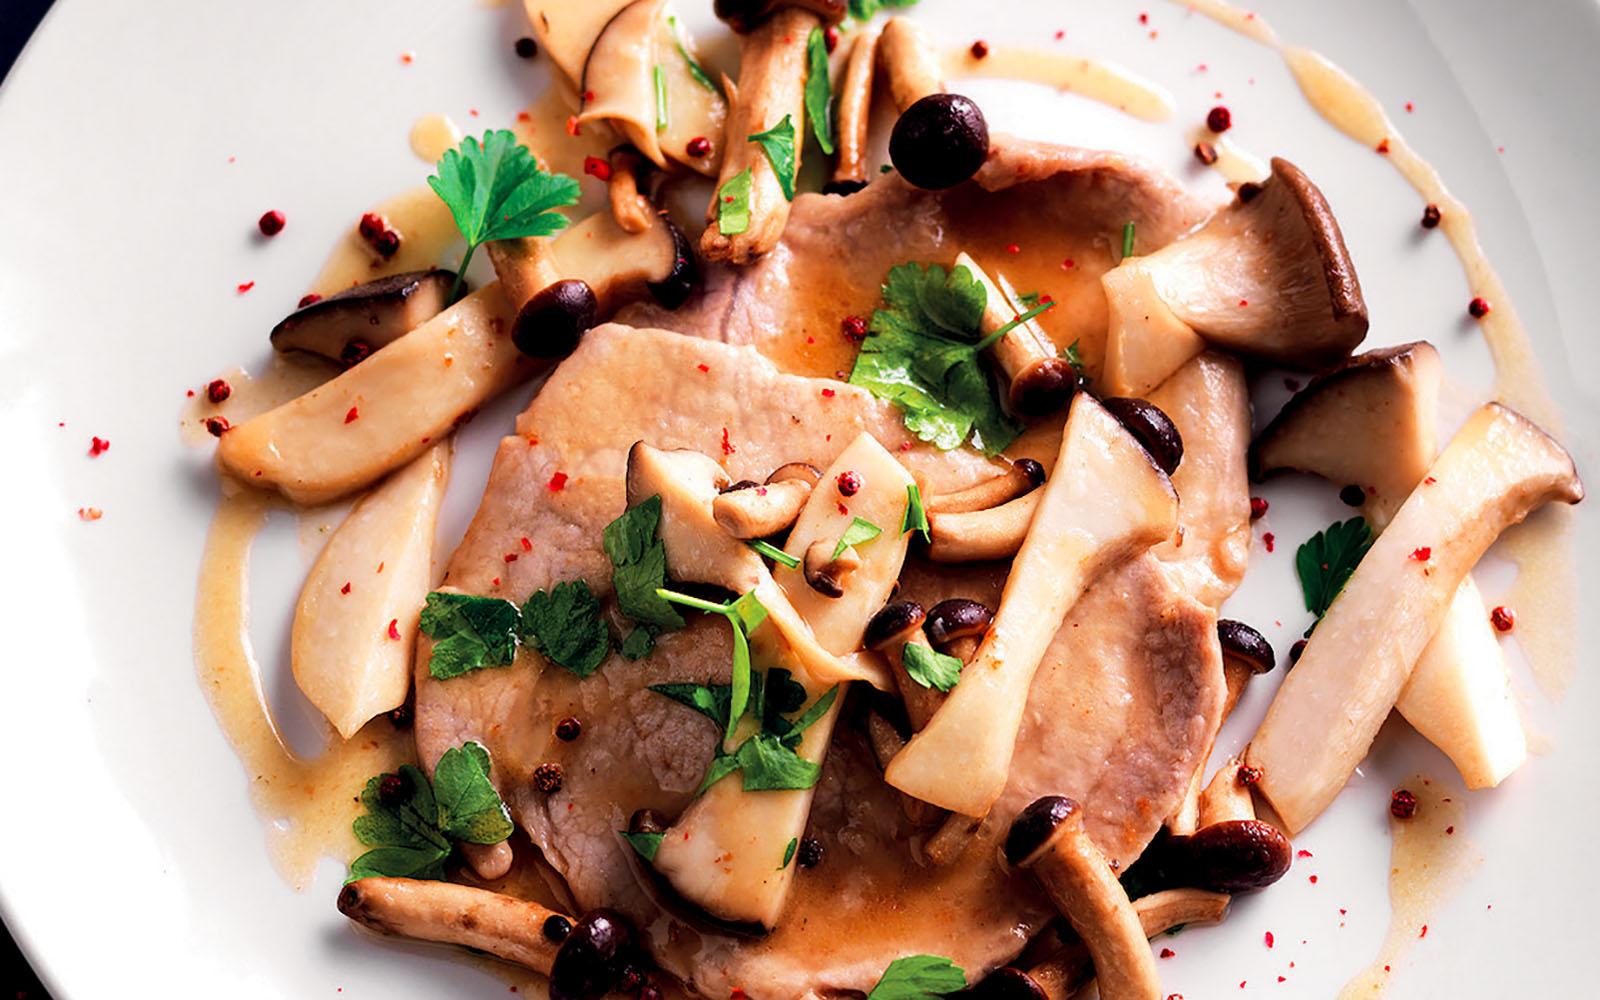 Scaloppine recipe with mushrooms